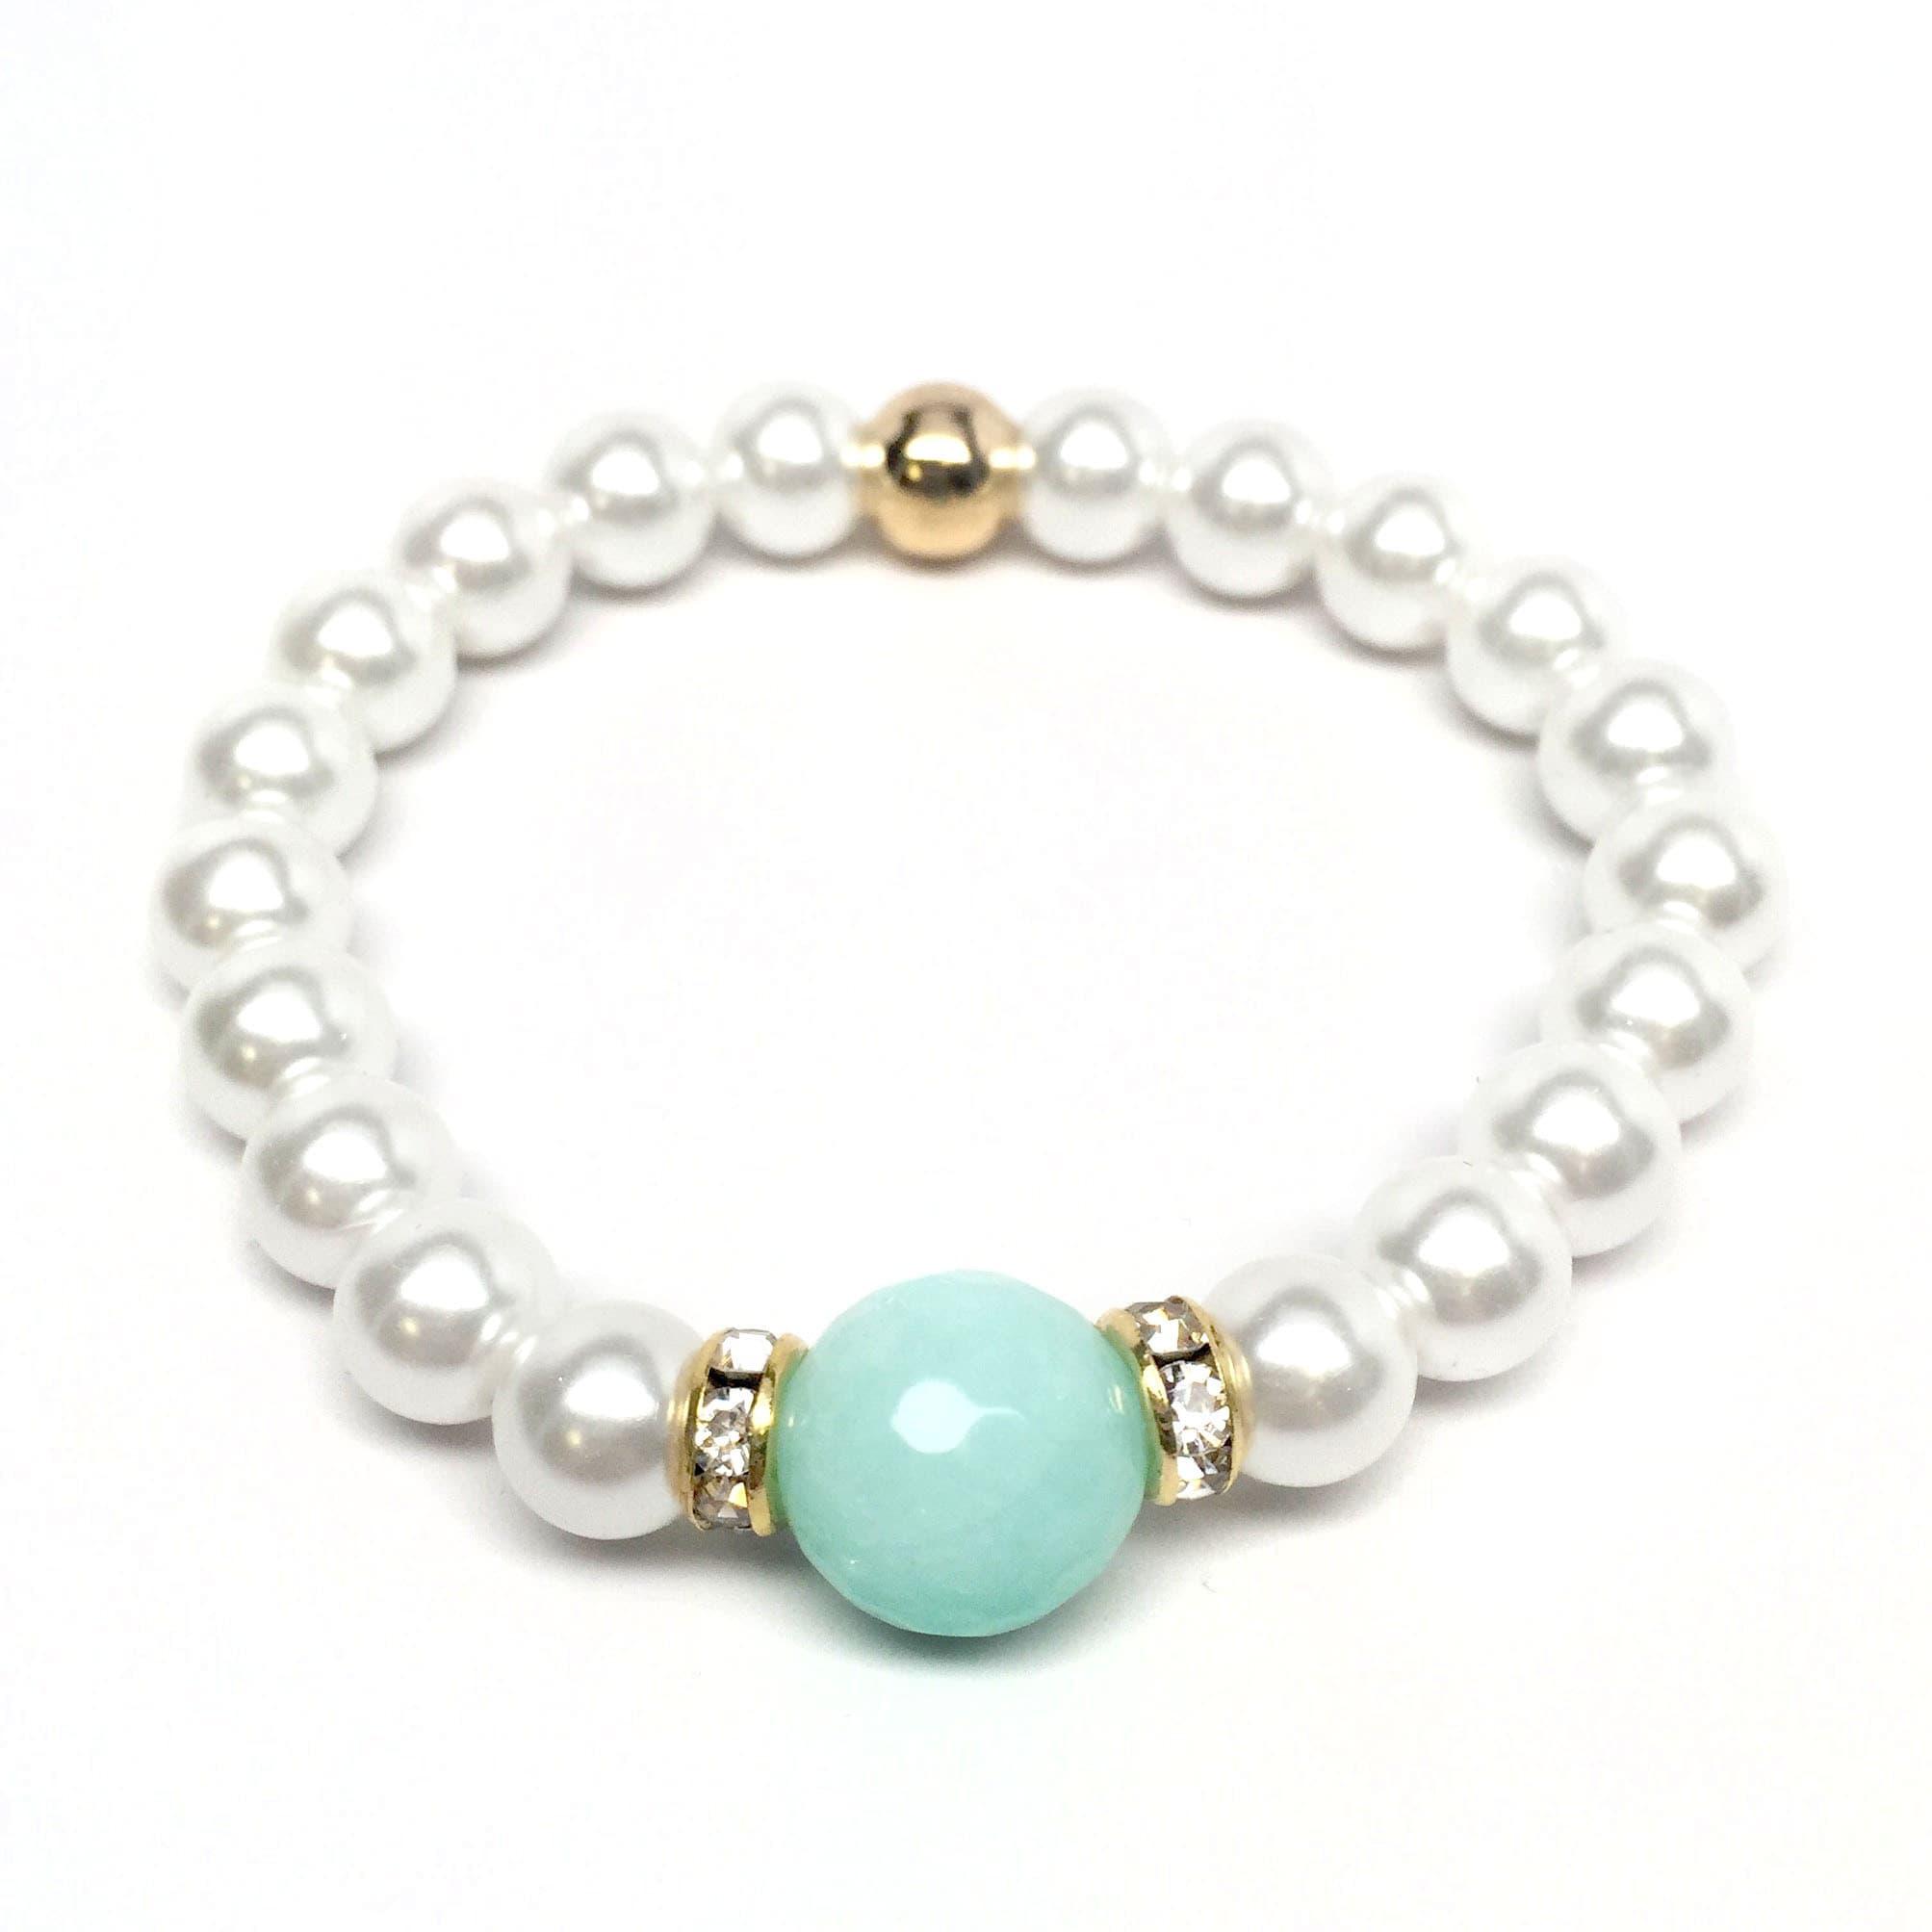 "Pearl & Aqua Quartz Joy 7"" Bracelet - Thumbnail 0"